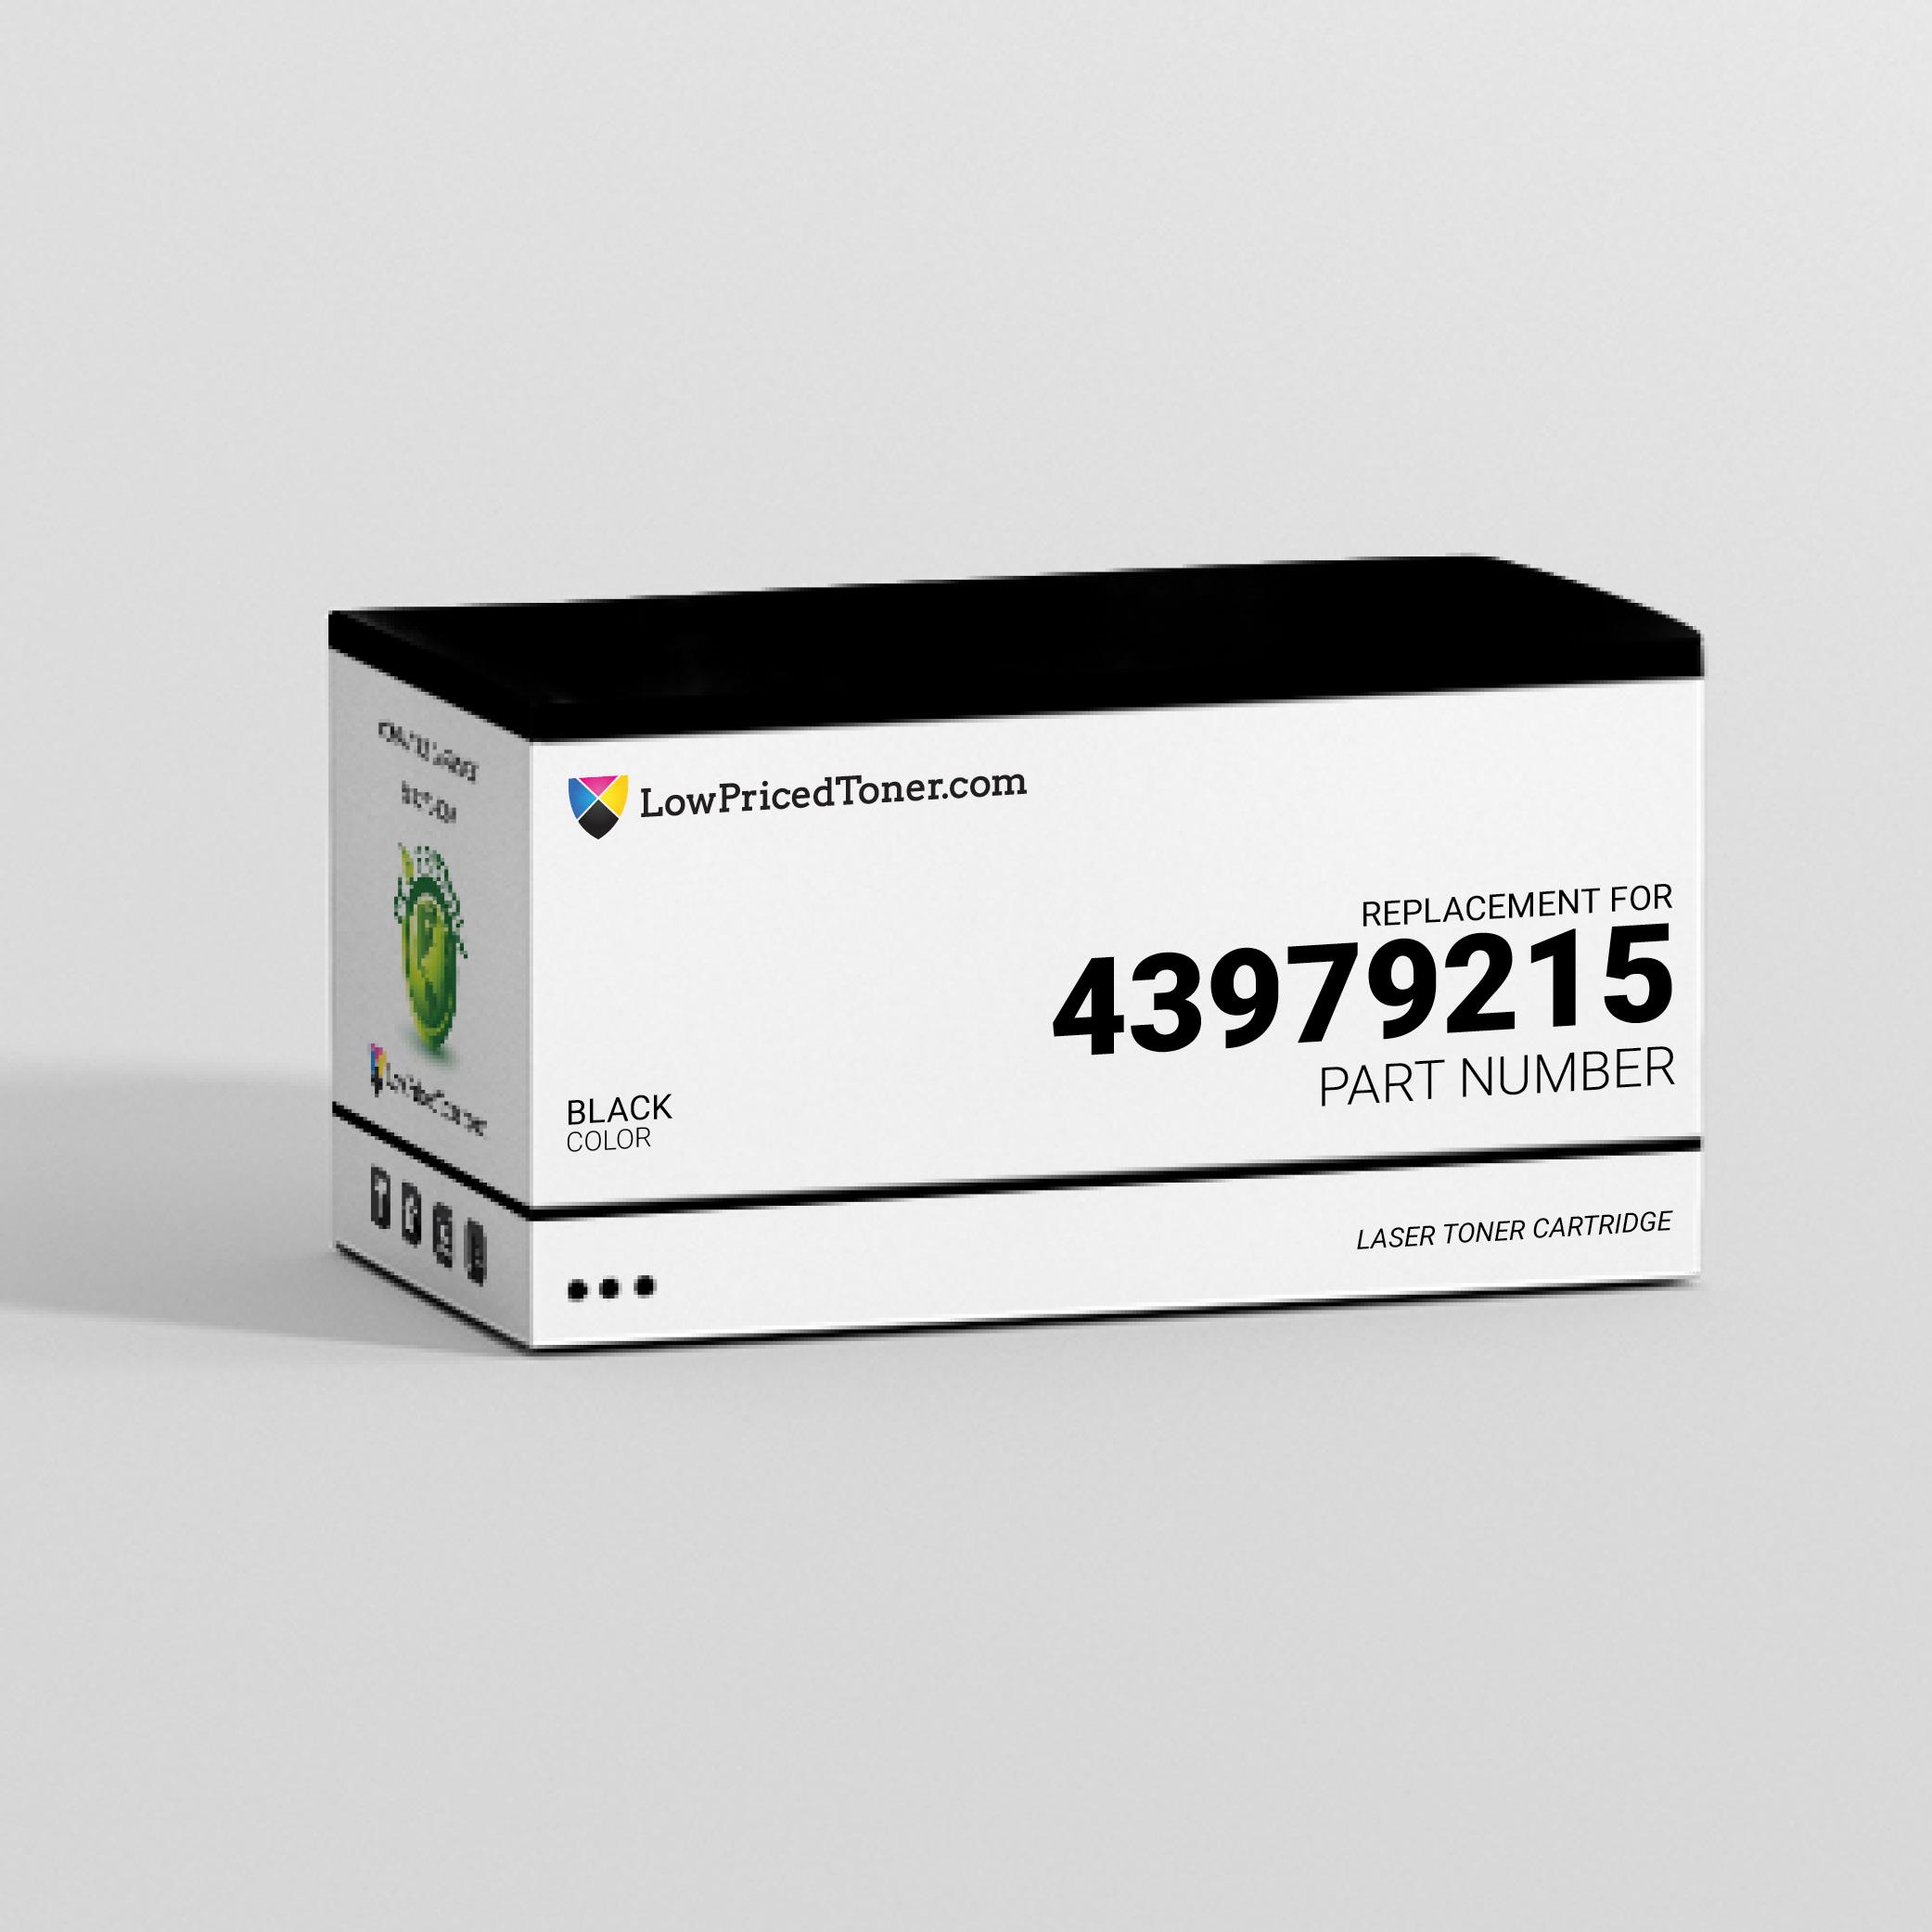 Okidata 43979215 Compatible Black Laser Toner Cartridge